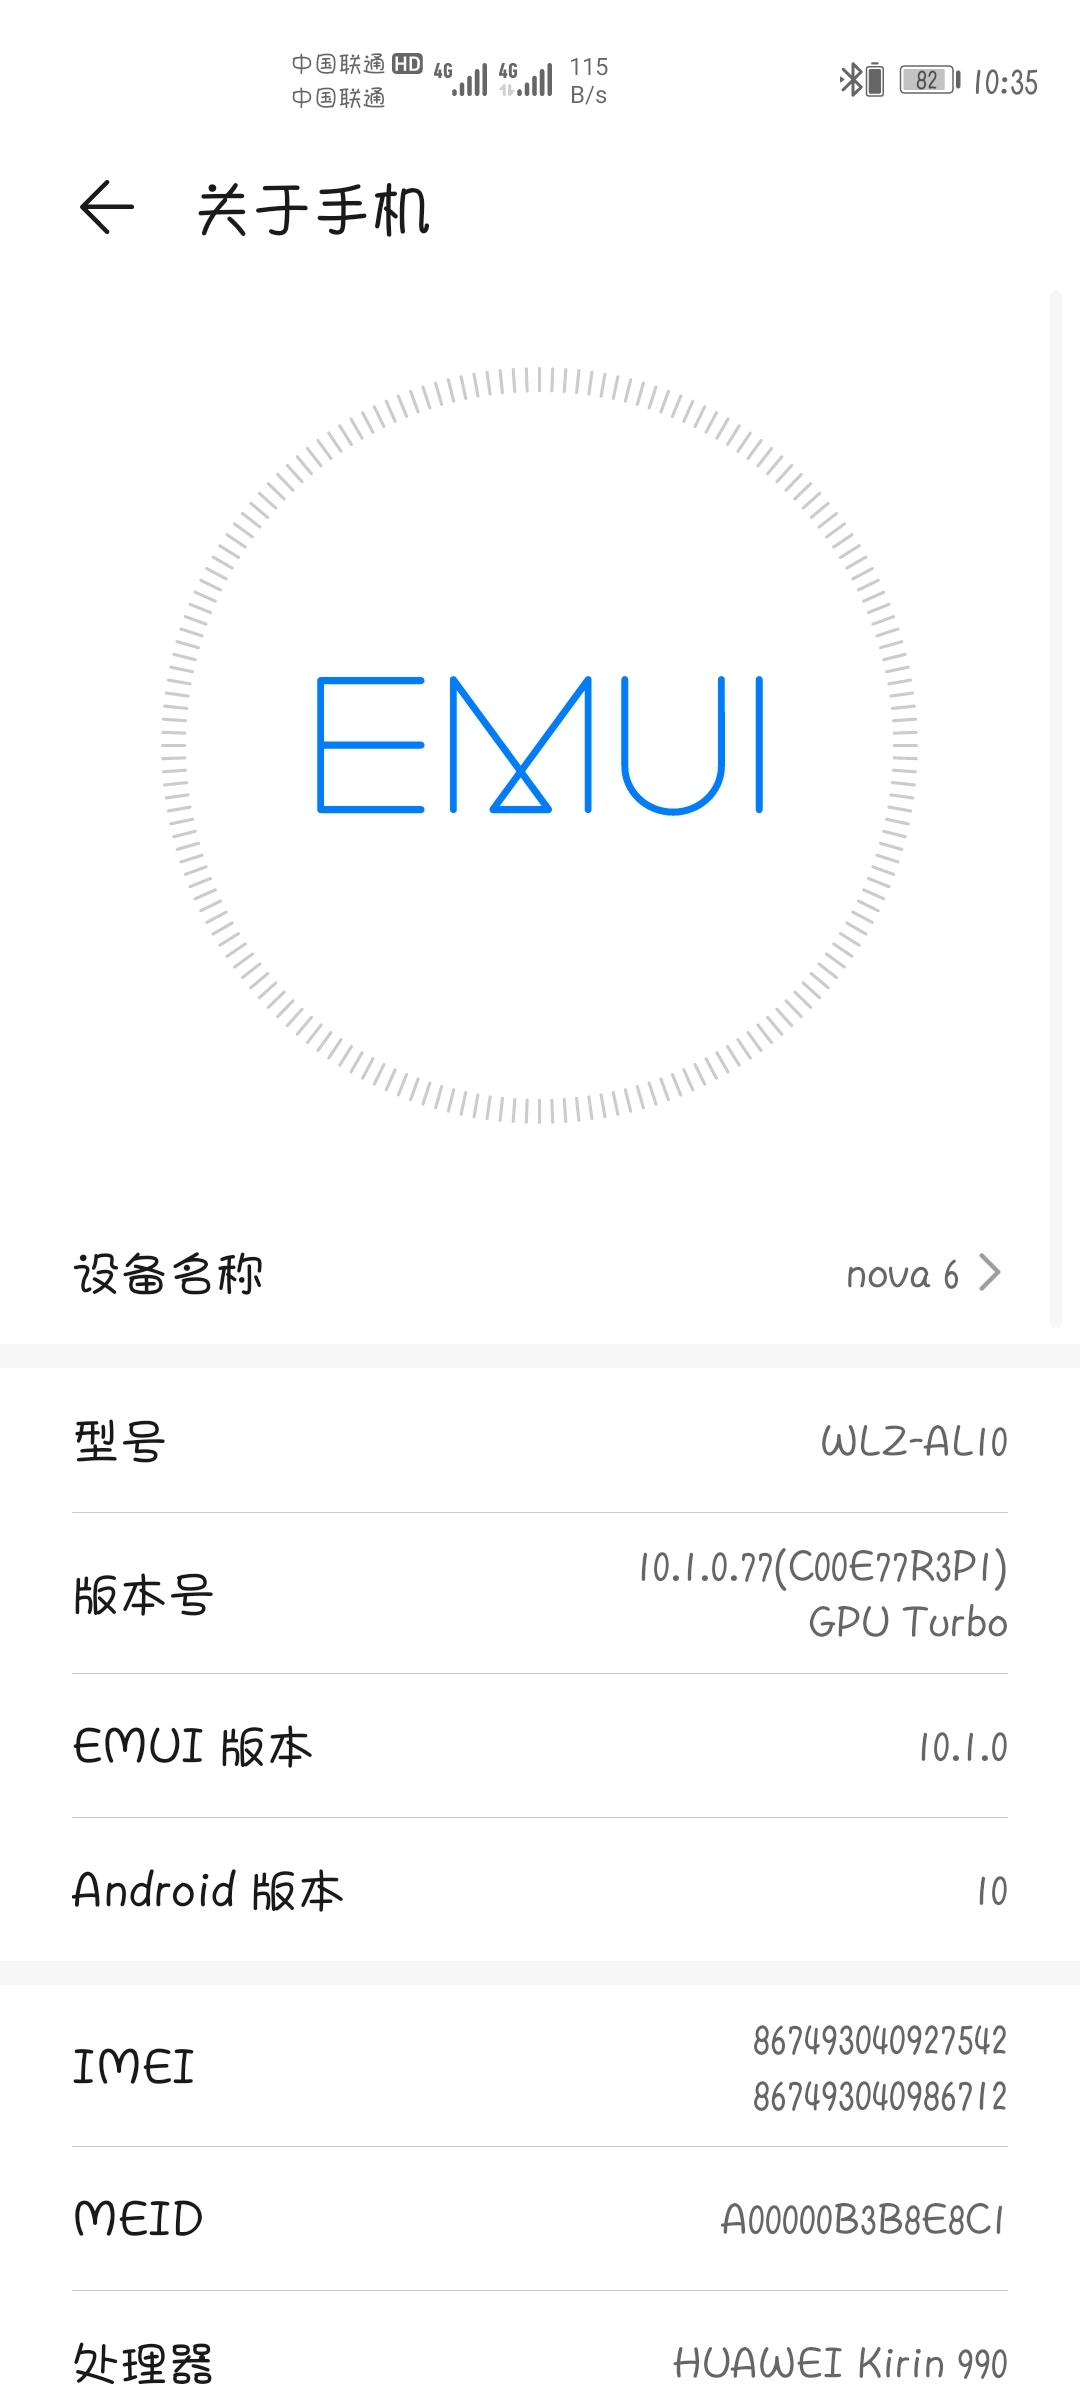 Screenshot_20200508_103539_com.android.settings.jpg